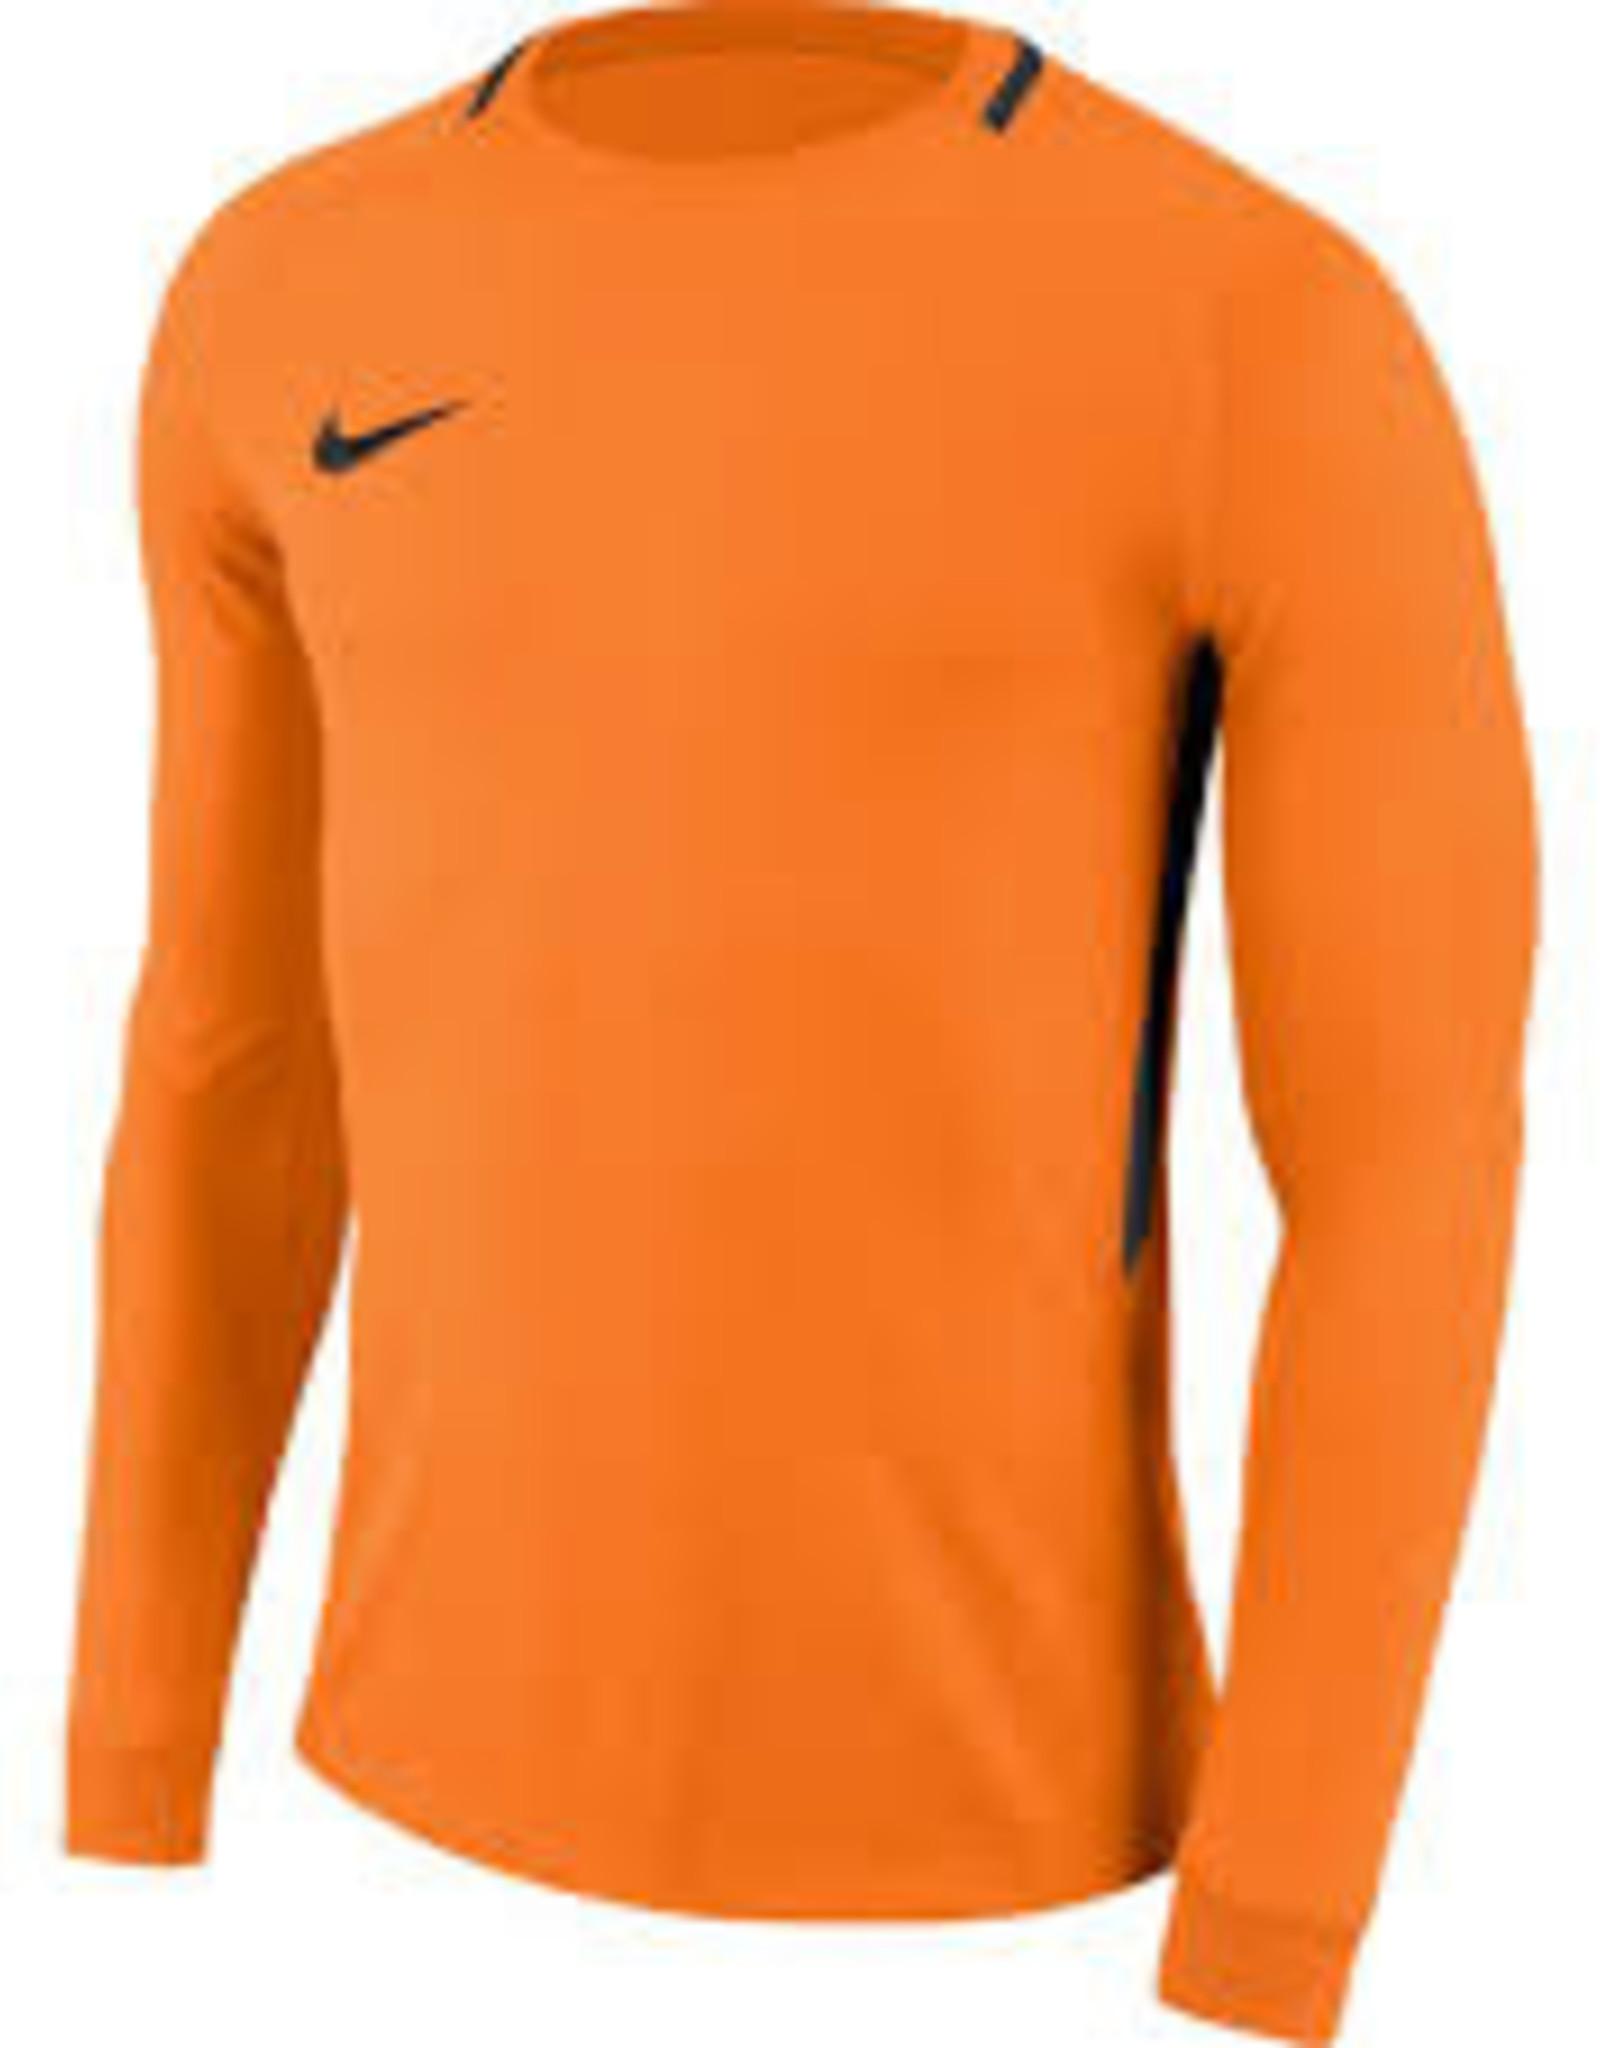 Park III Goalkeeper Jersey